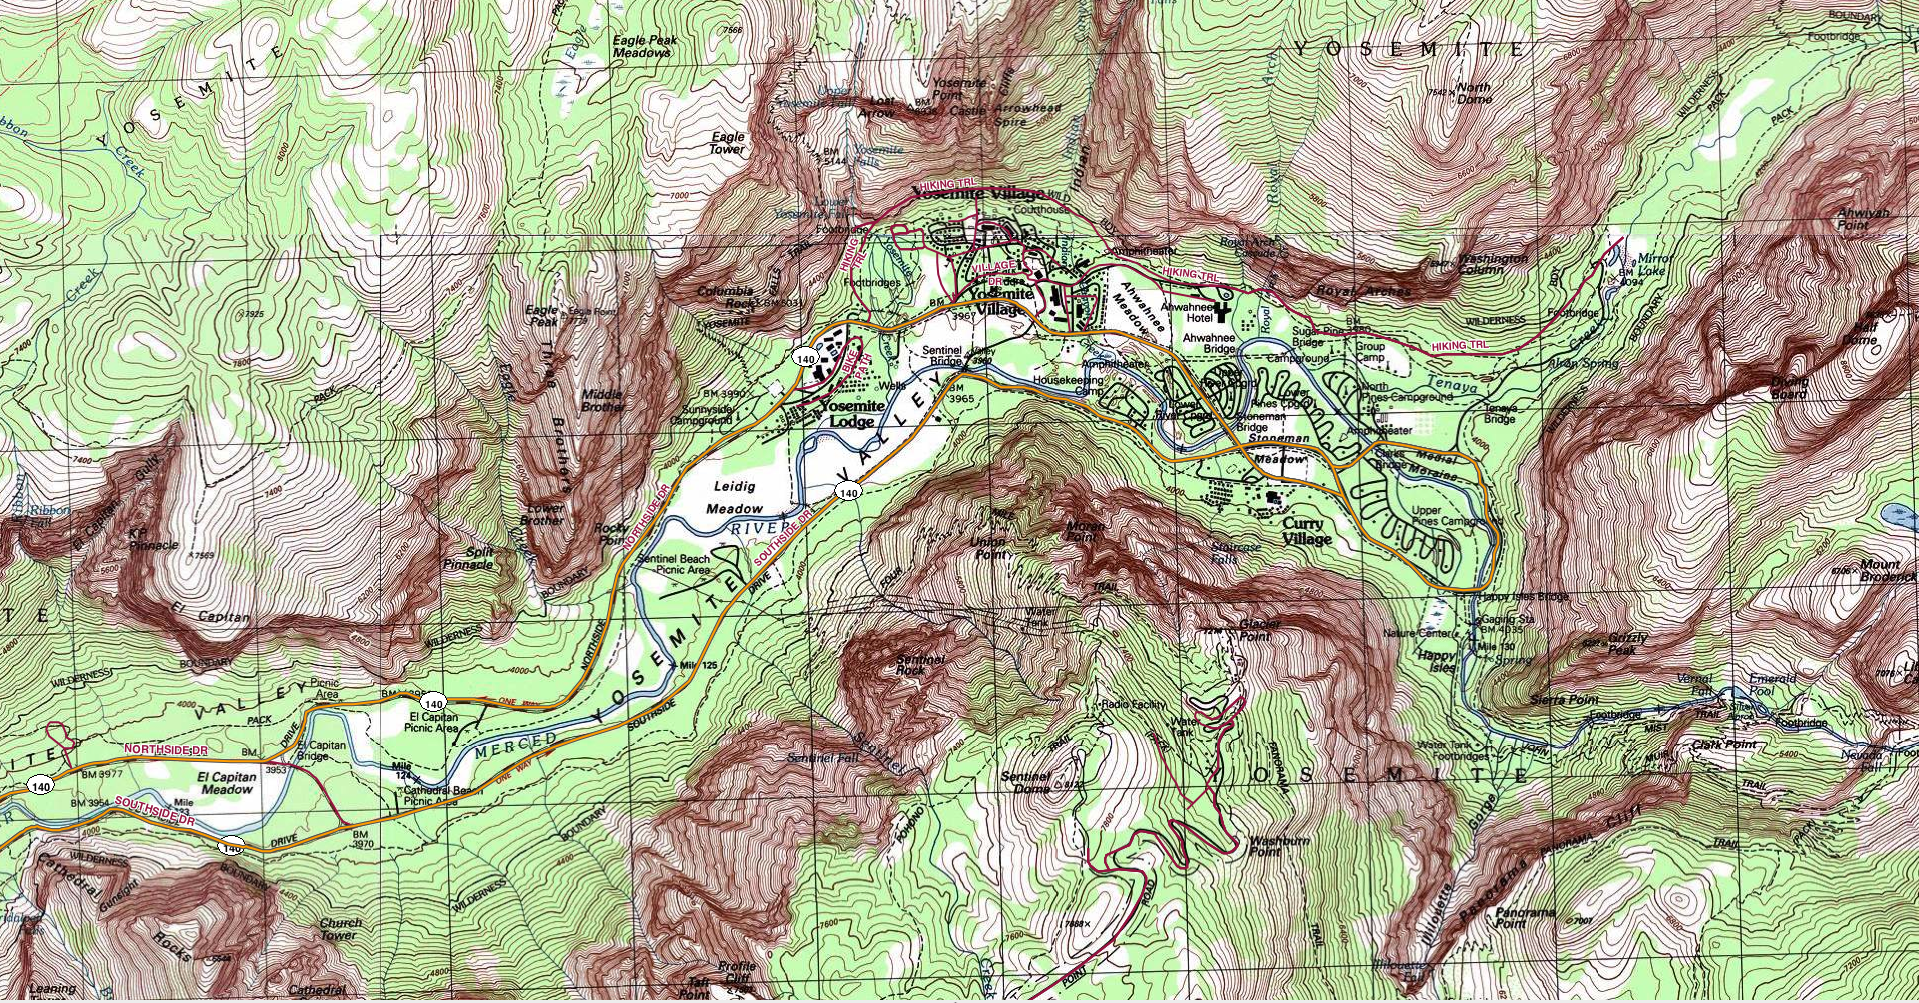 Yosemite yosemite valley topo publicscrutiny Choice Image